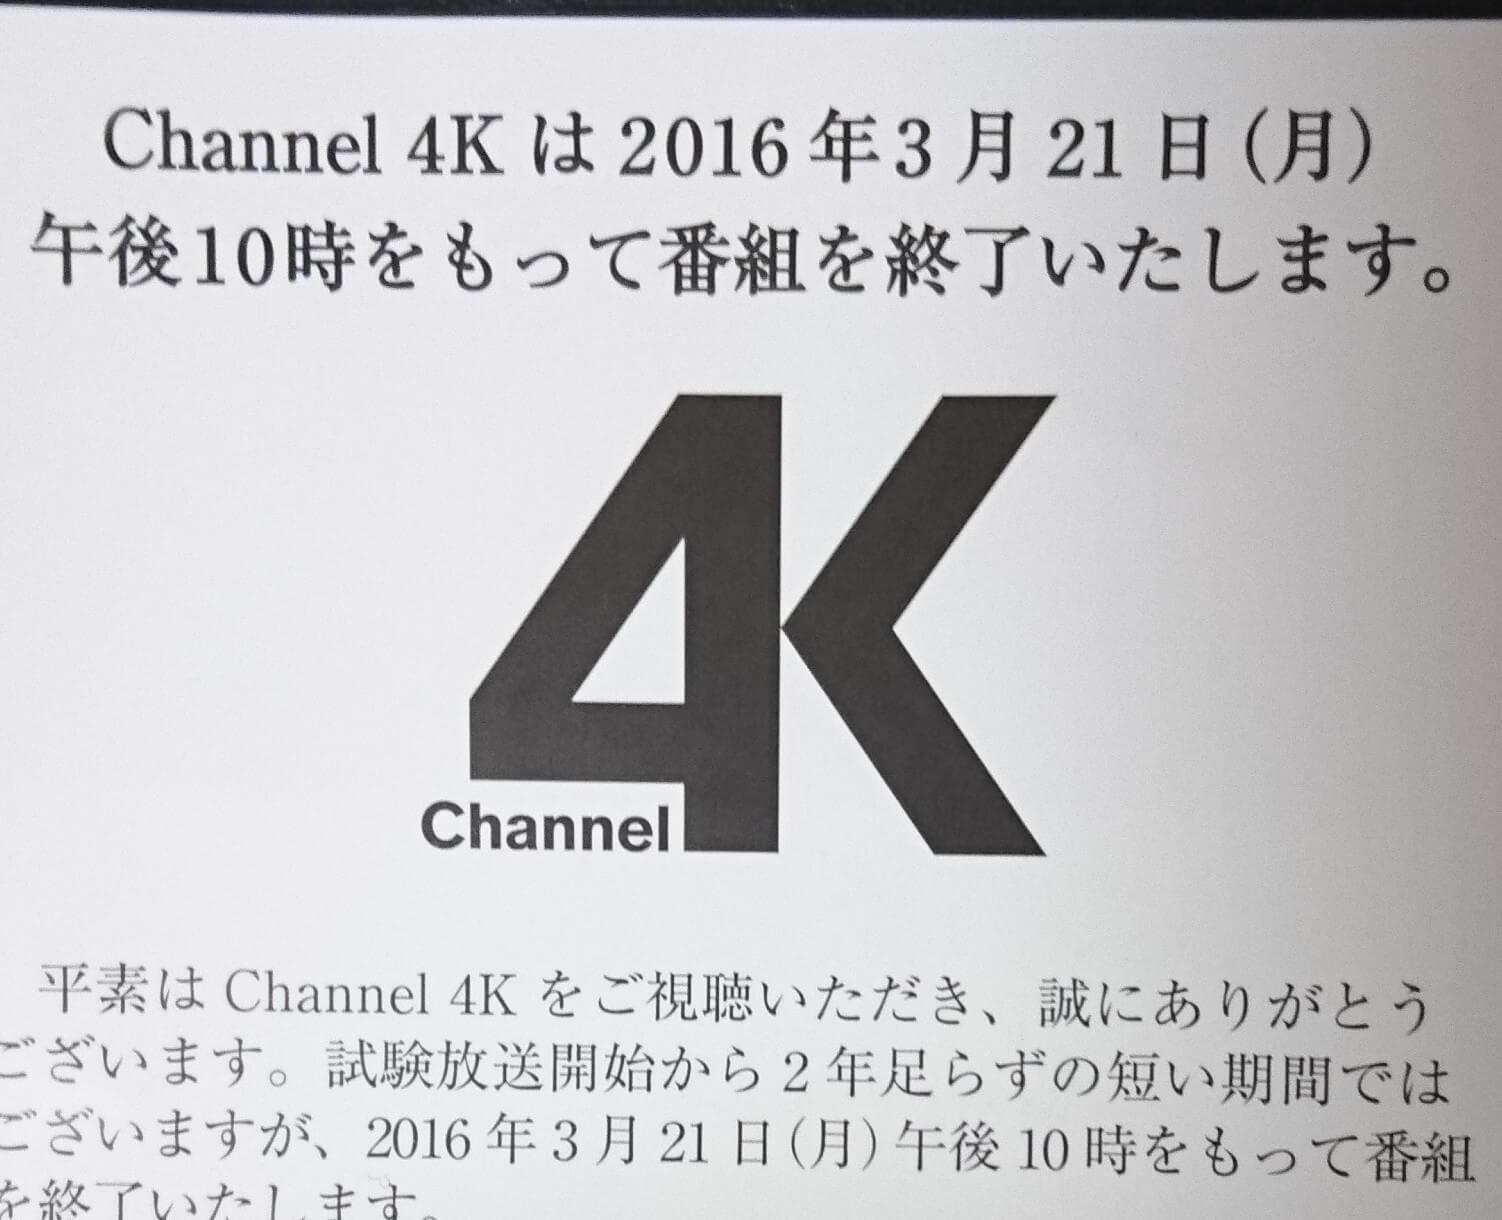 「Channel 4K」終了のお知らせが来た!